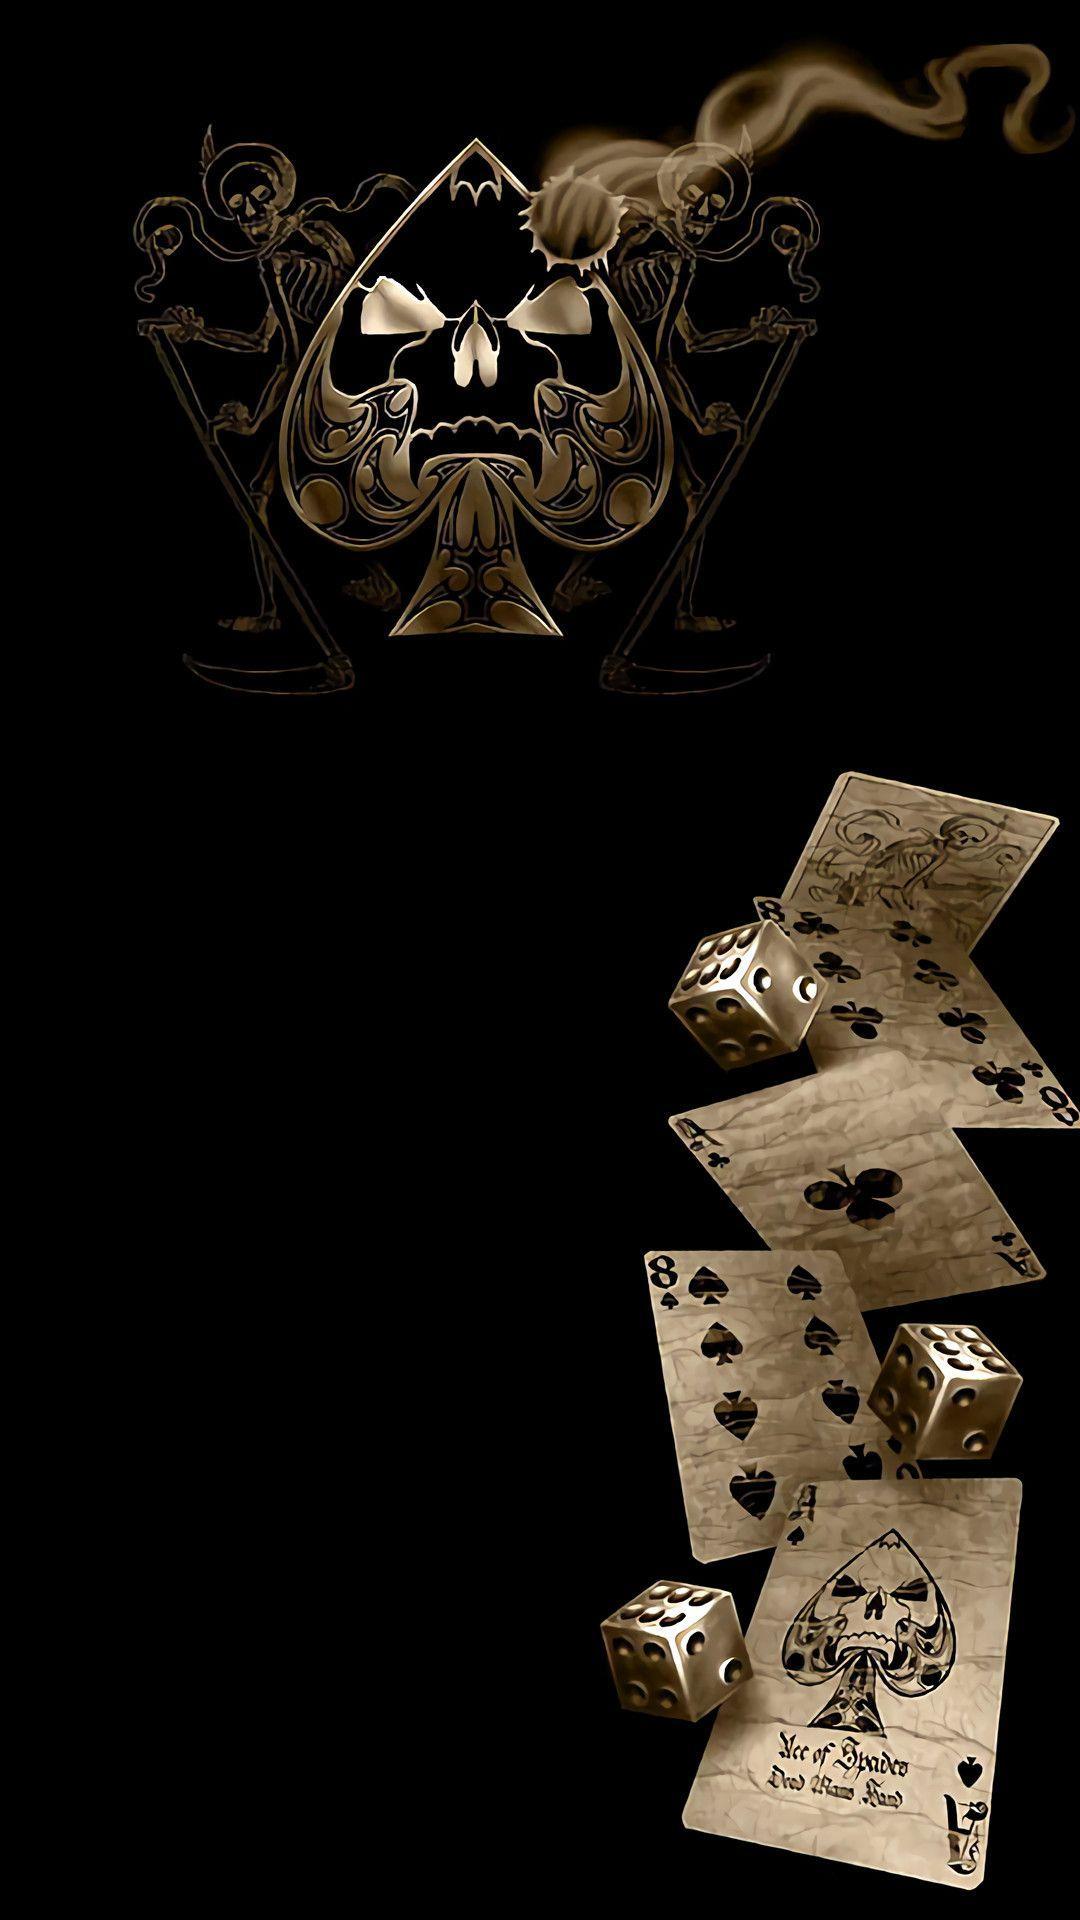 Ace Card Wallpaper : wallpaper, Wallpapers, Wallpaper